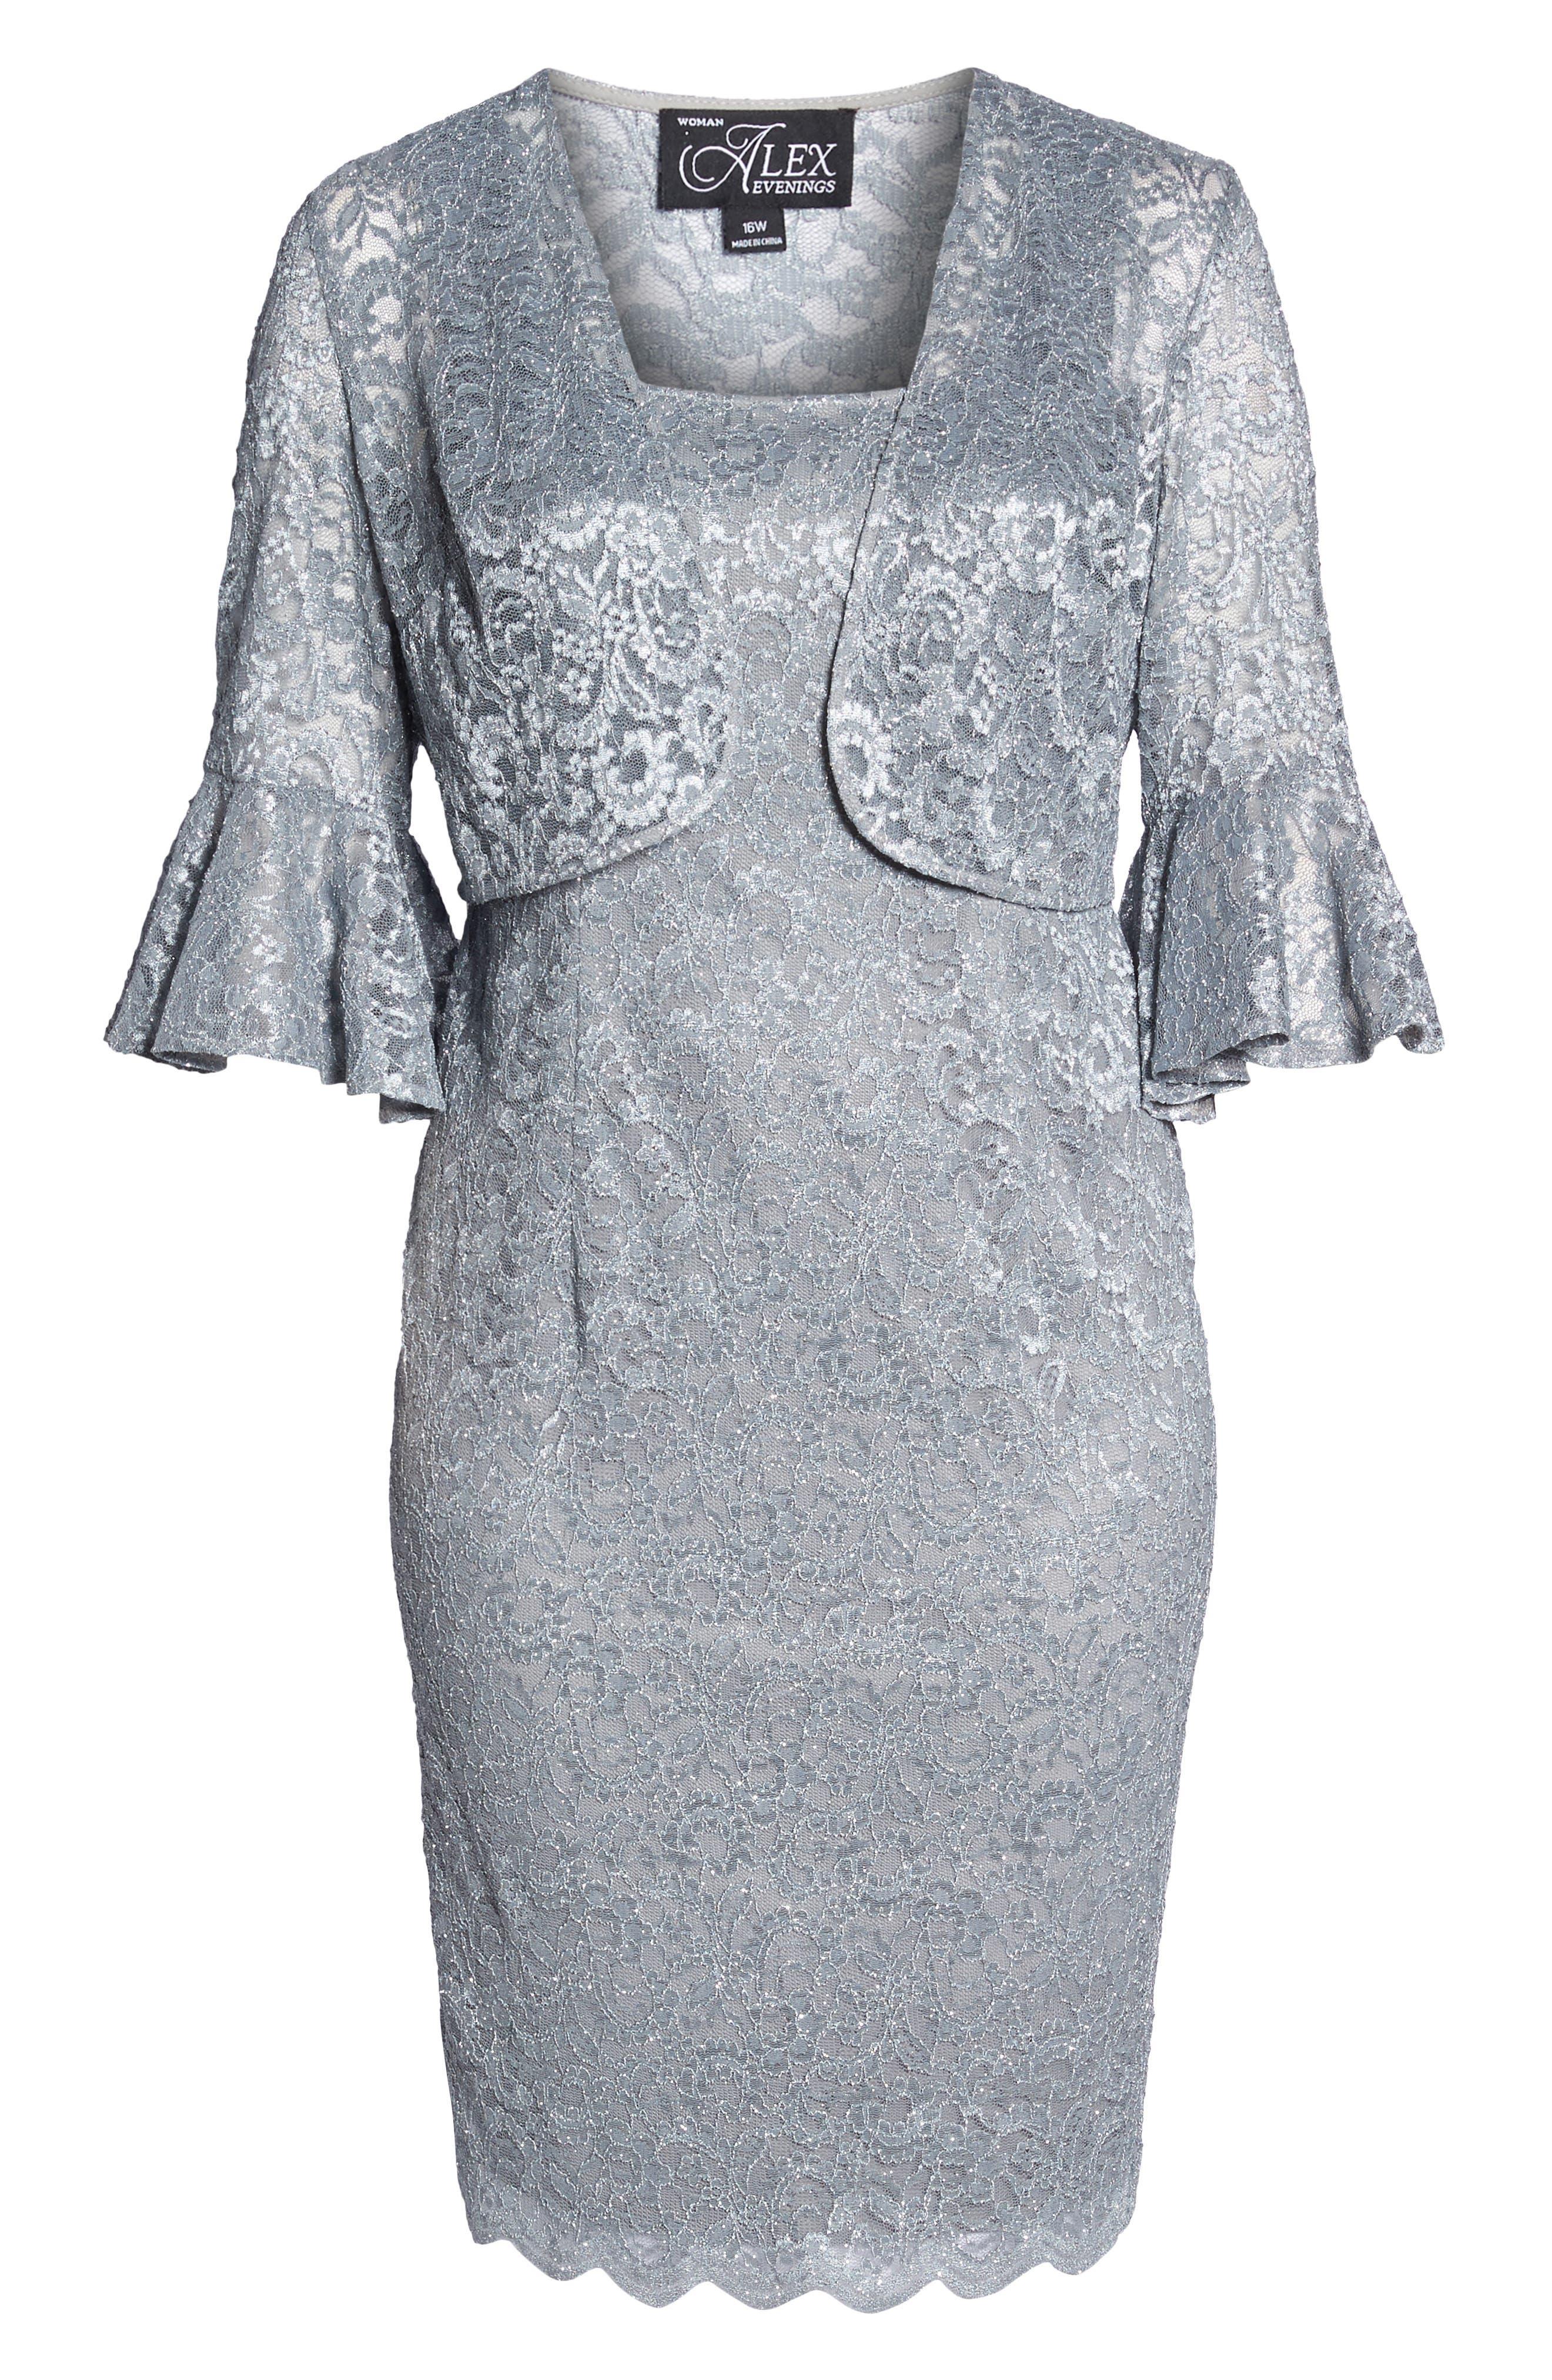 ALEX EVENINGS,                             Lace Sheath Dress with Bolero Jacket,                             Alternate thumbnail 6, color,                             040